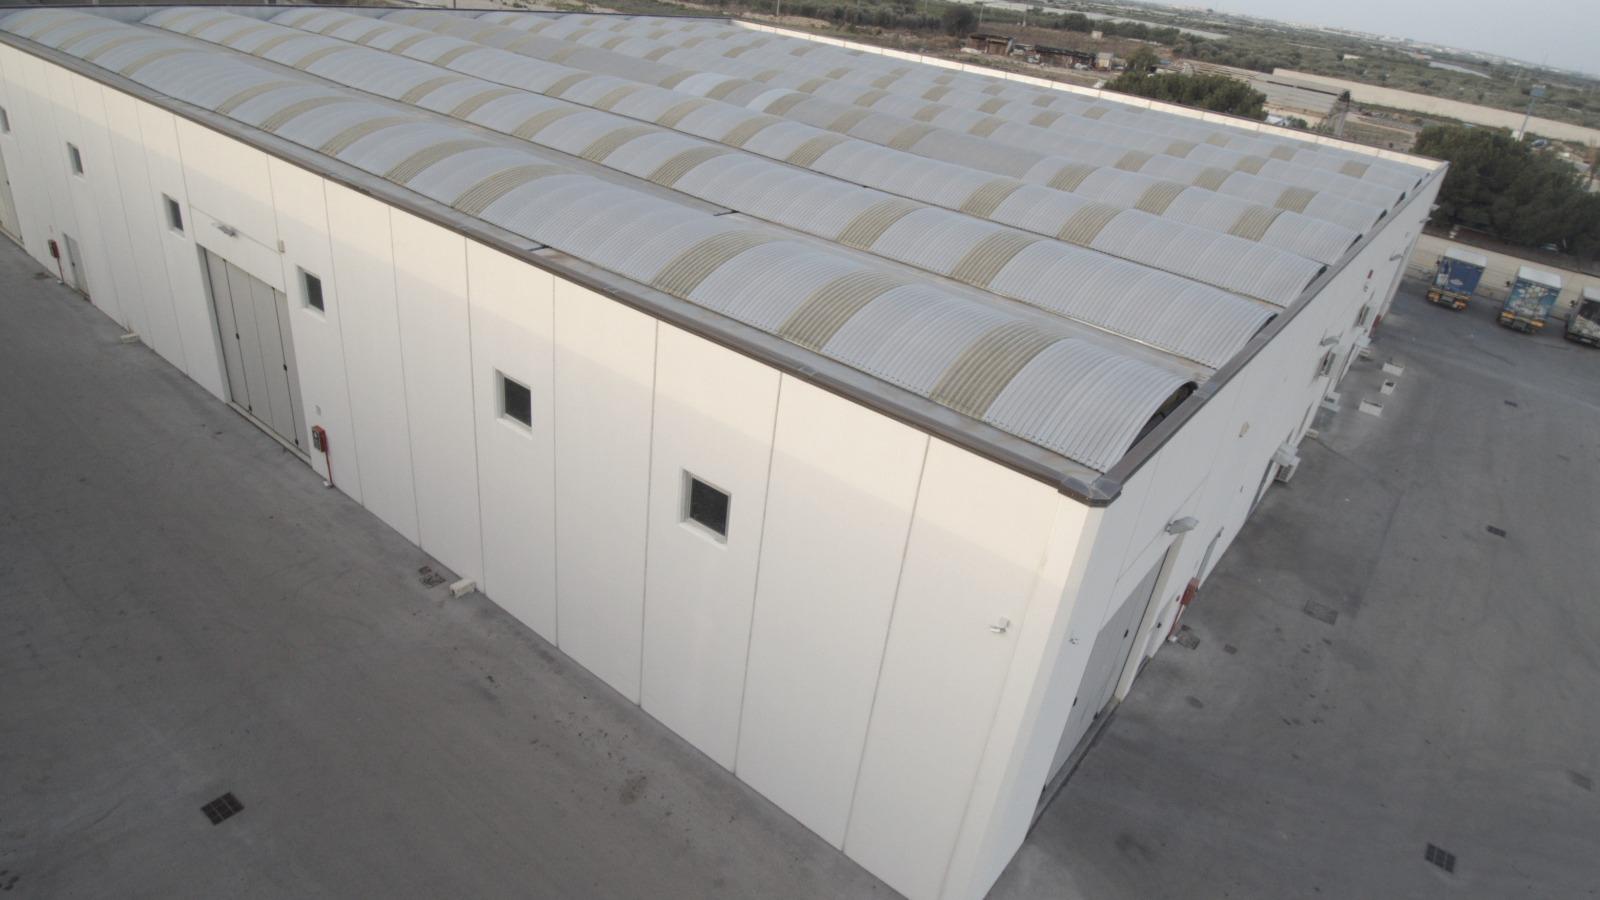 capannoni-industriali-pepe-a-bari-1